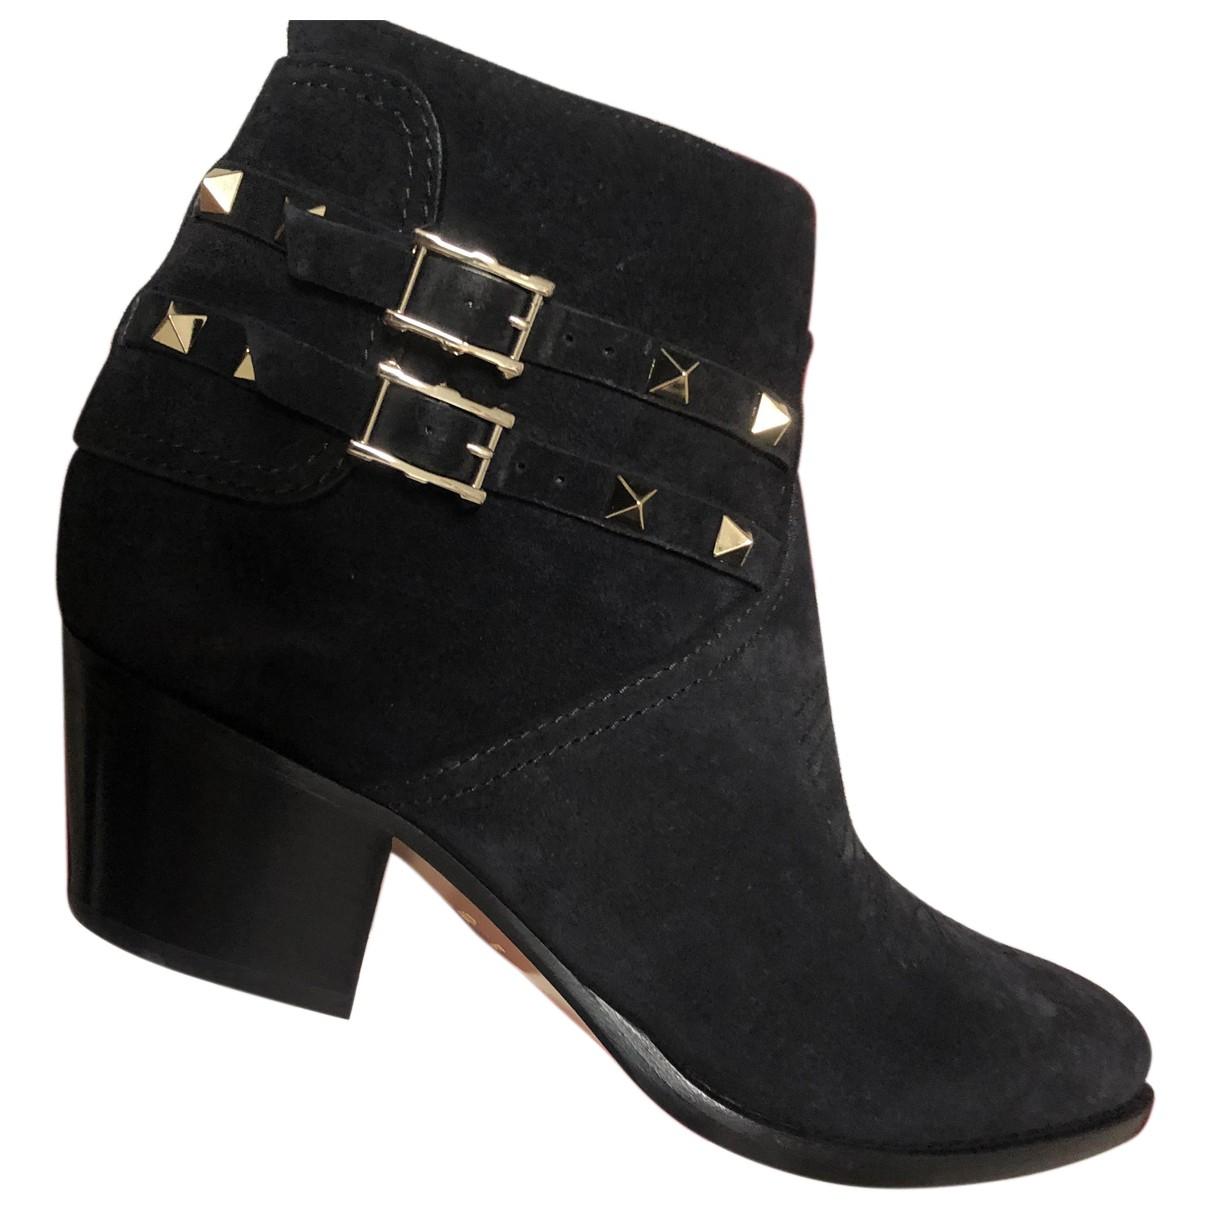 Valentino Garavani Rockstud Black Suede Ankle boots for Women 41 IT